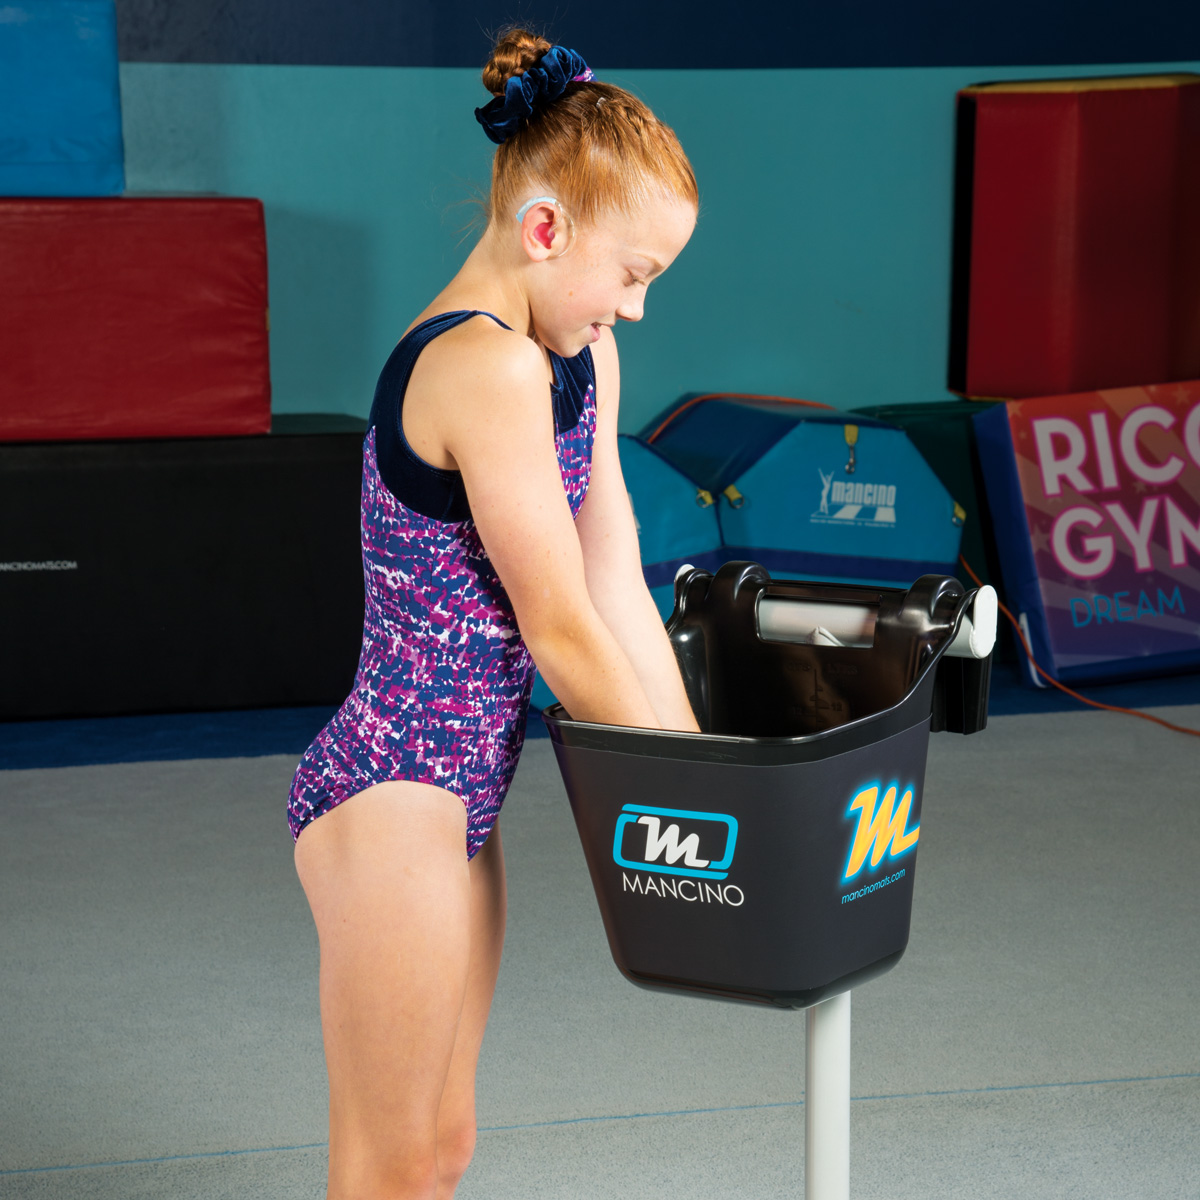 mancino gymnastics chalk stand girl gymnast